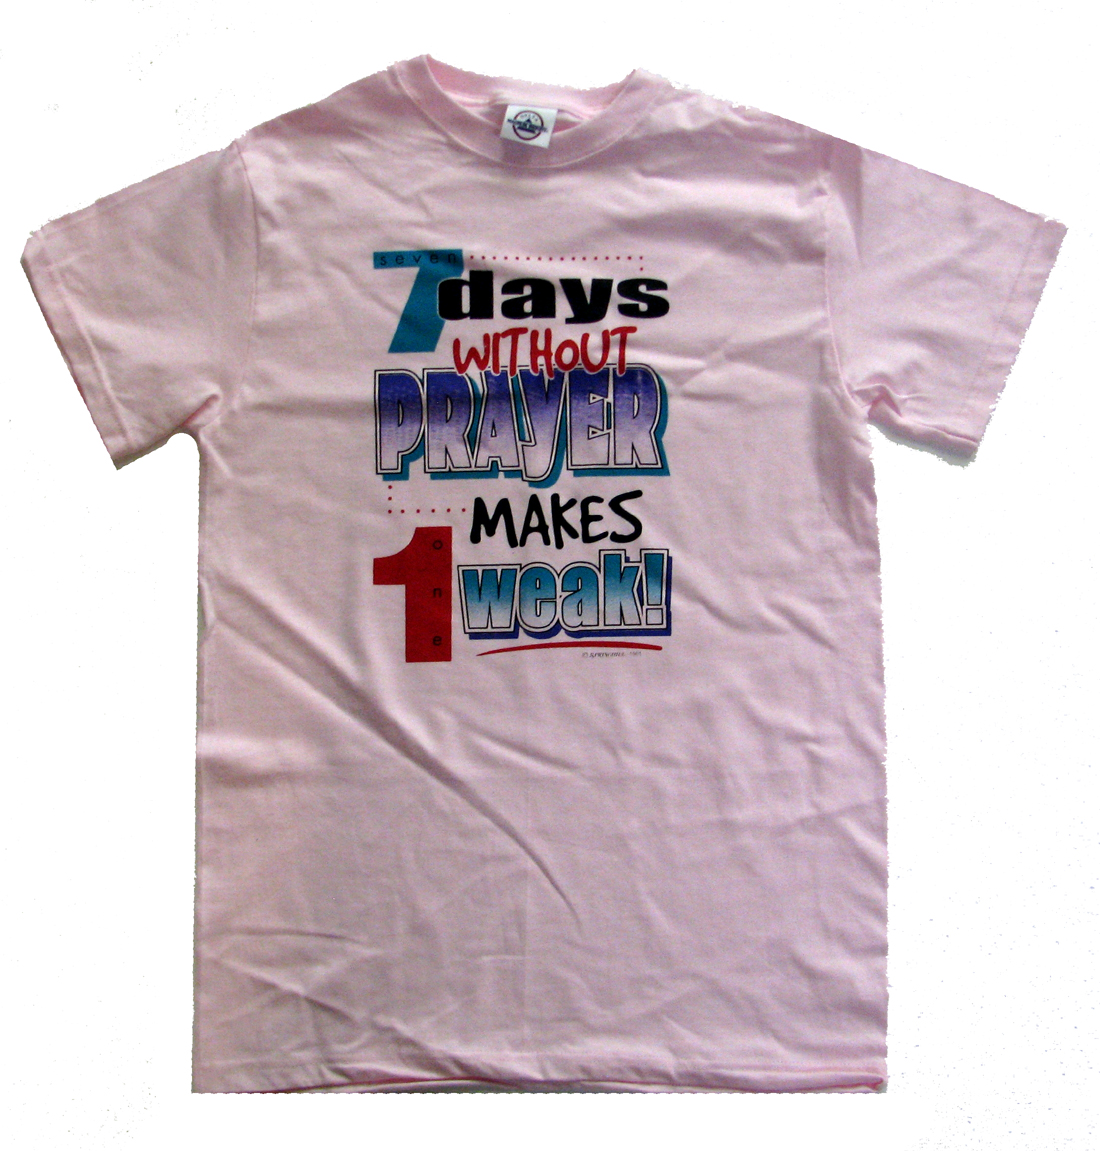 Trenz Shirt Company Christian T-shirt 7 Days Without Prayer 1 Week at Sears.com